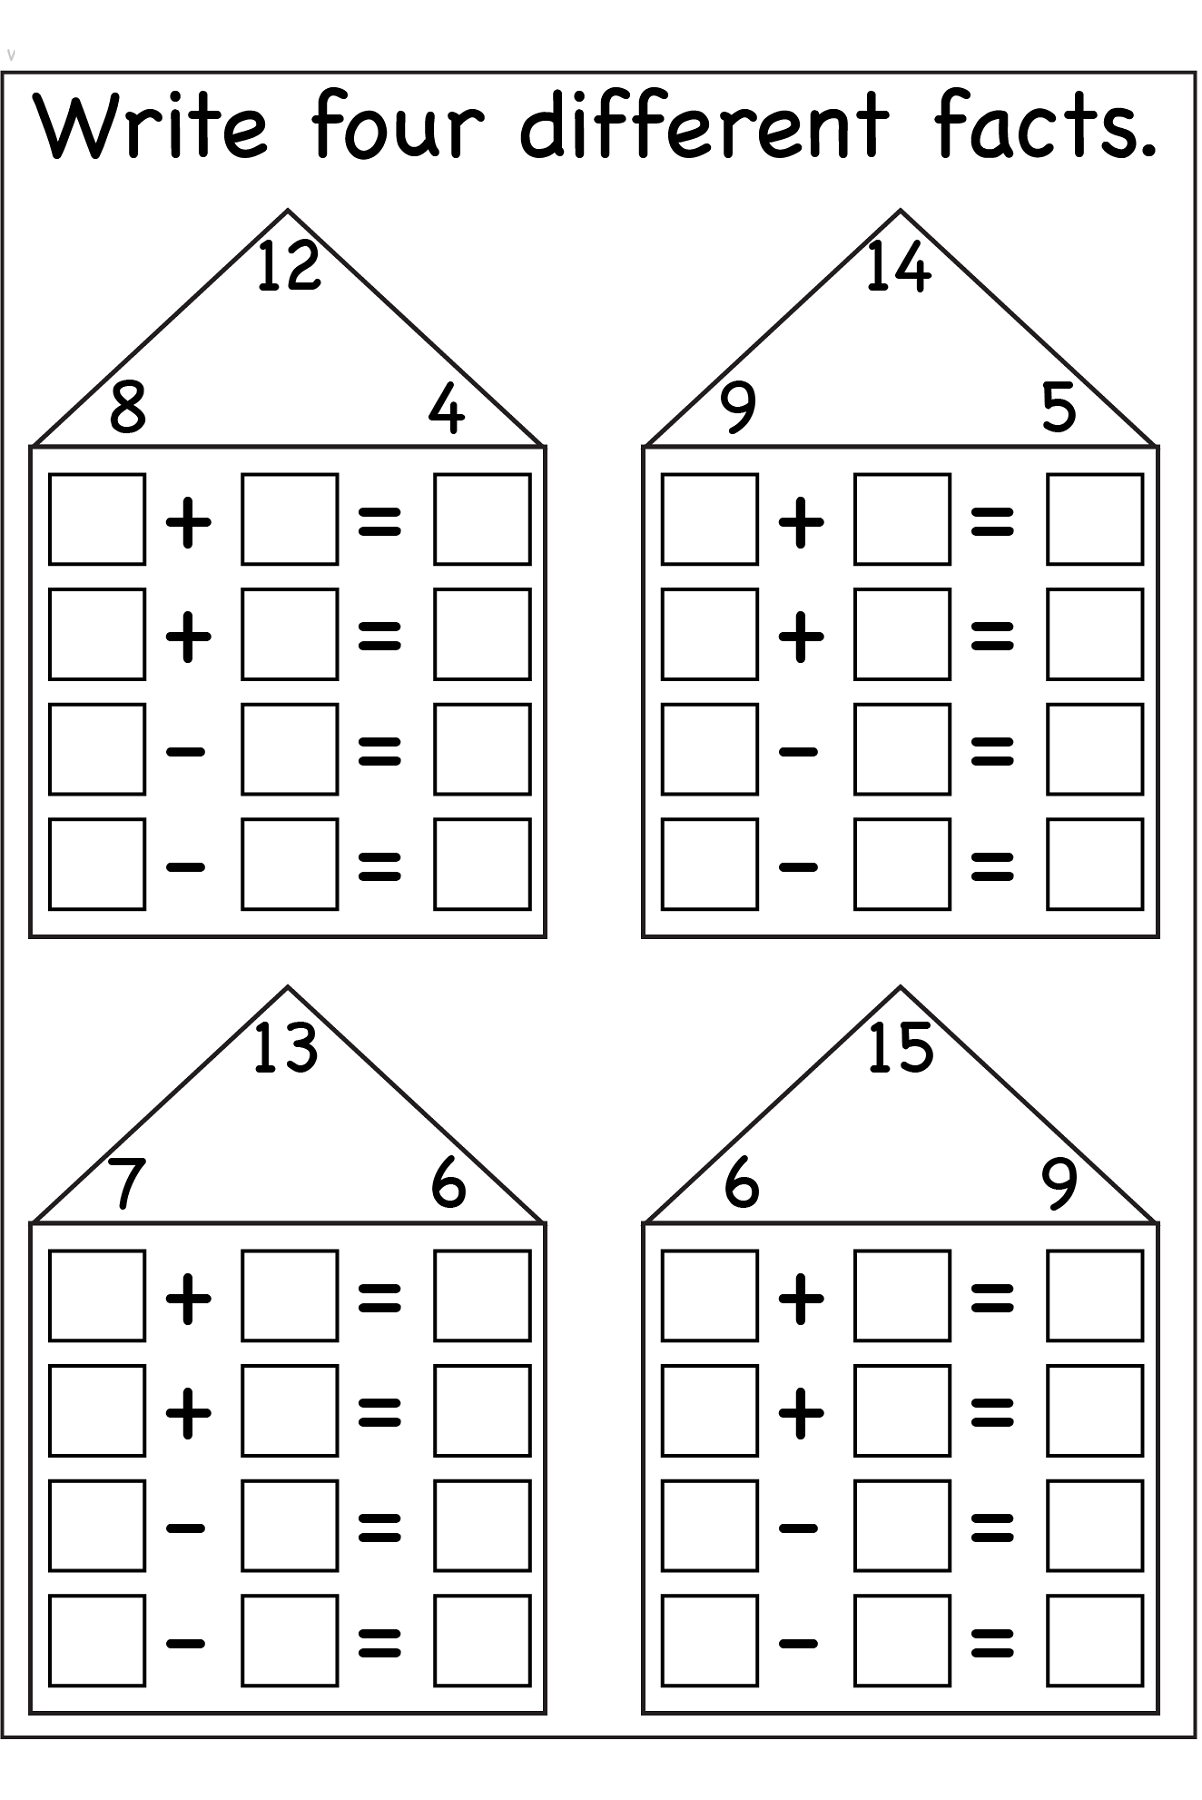 hight resolution of Fact Family Worksheets Printable   Fact family worksheet